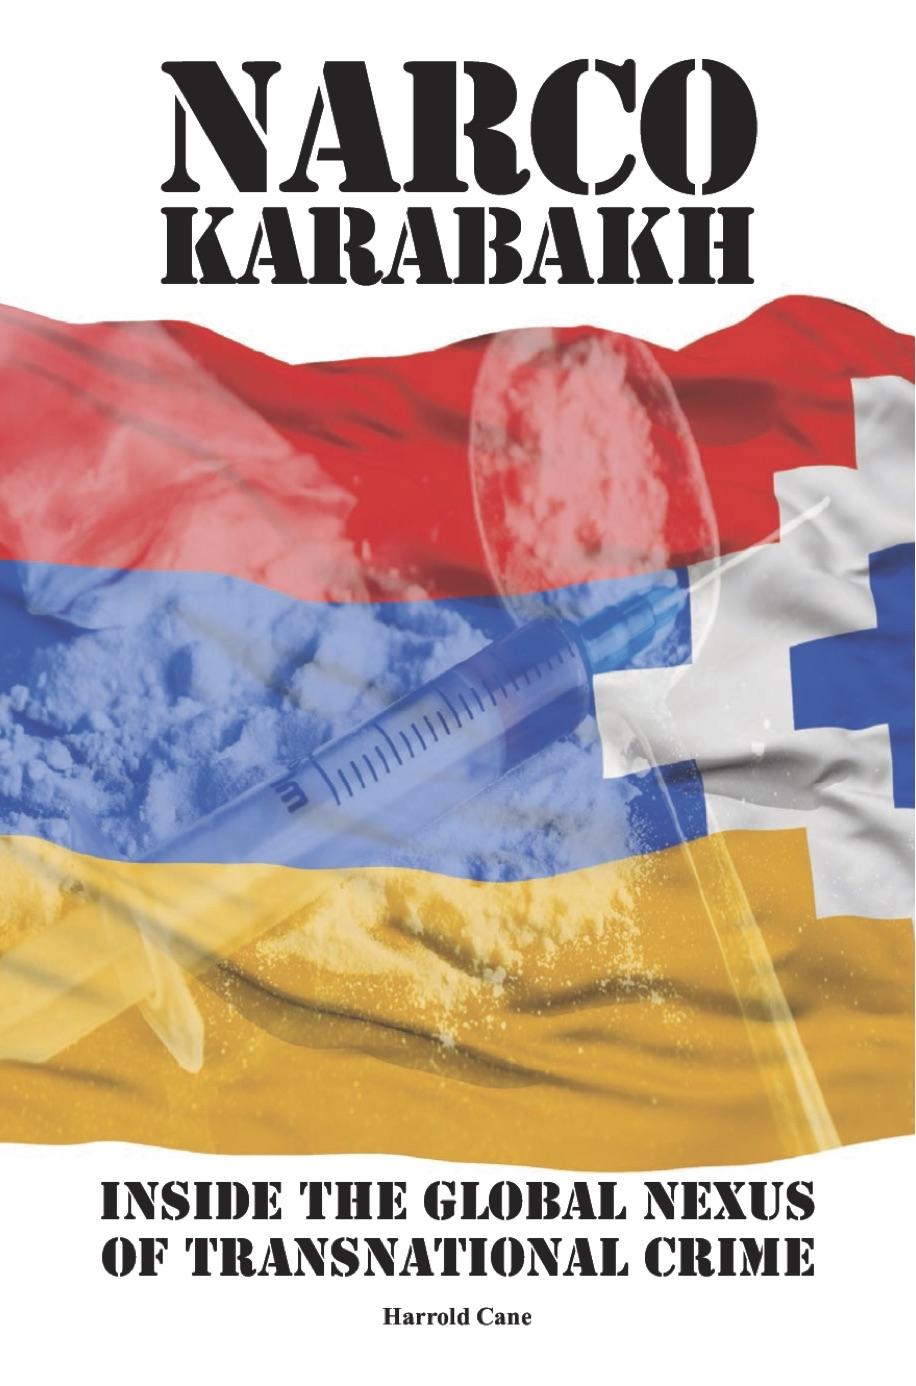 New Book Claims To Expose Karabakh As International Crime Hub Eurasianet